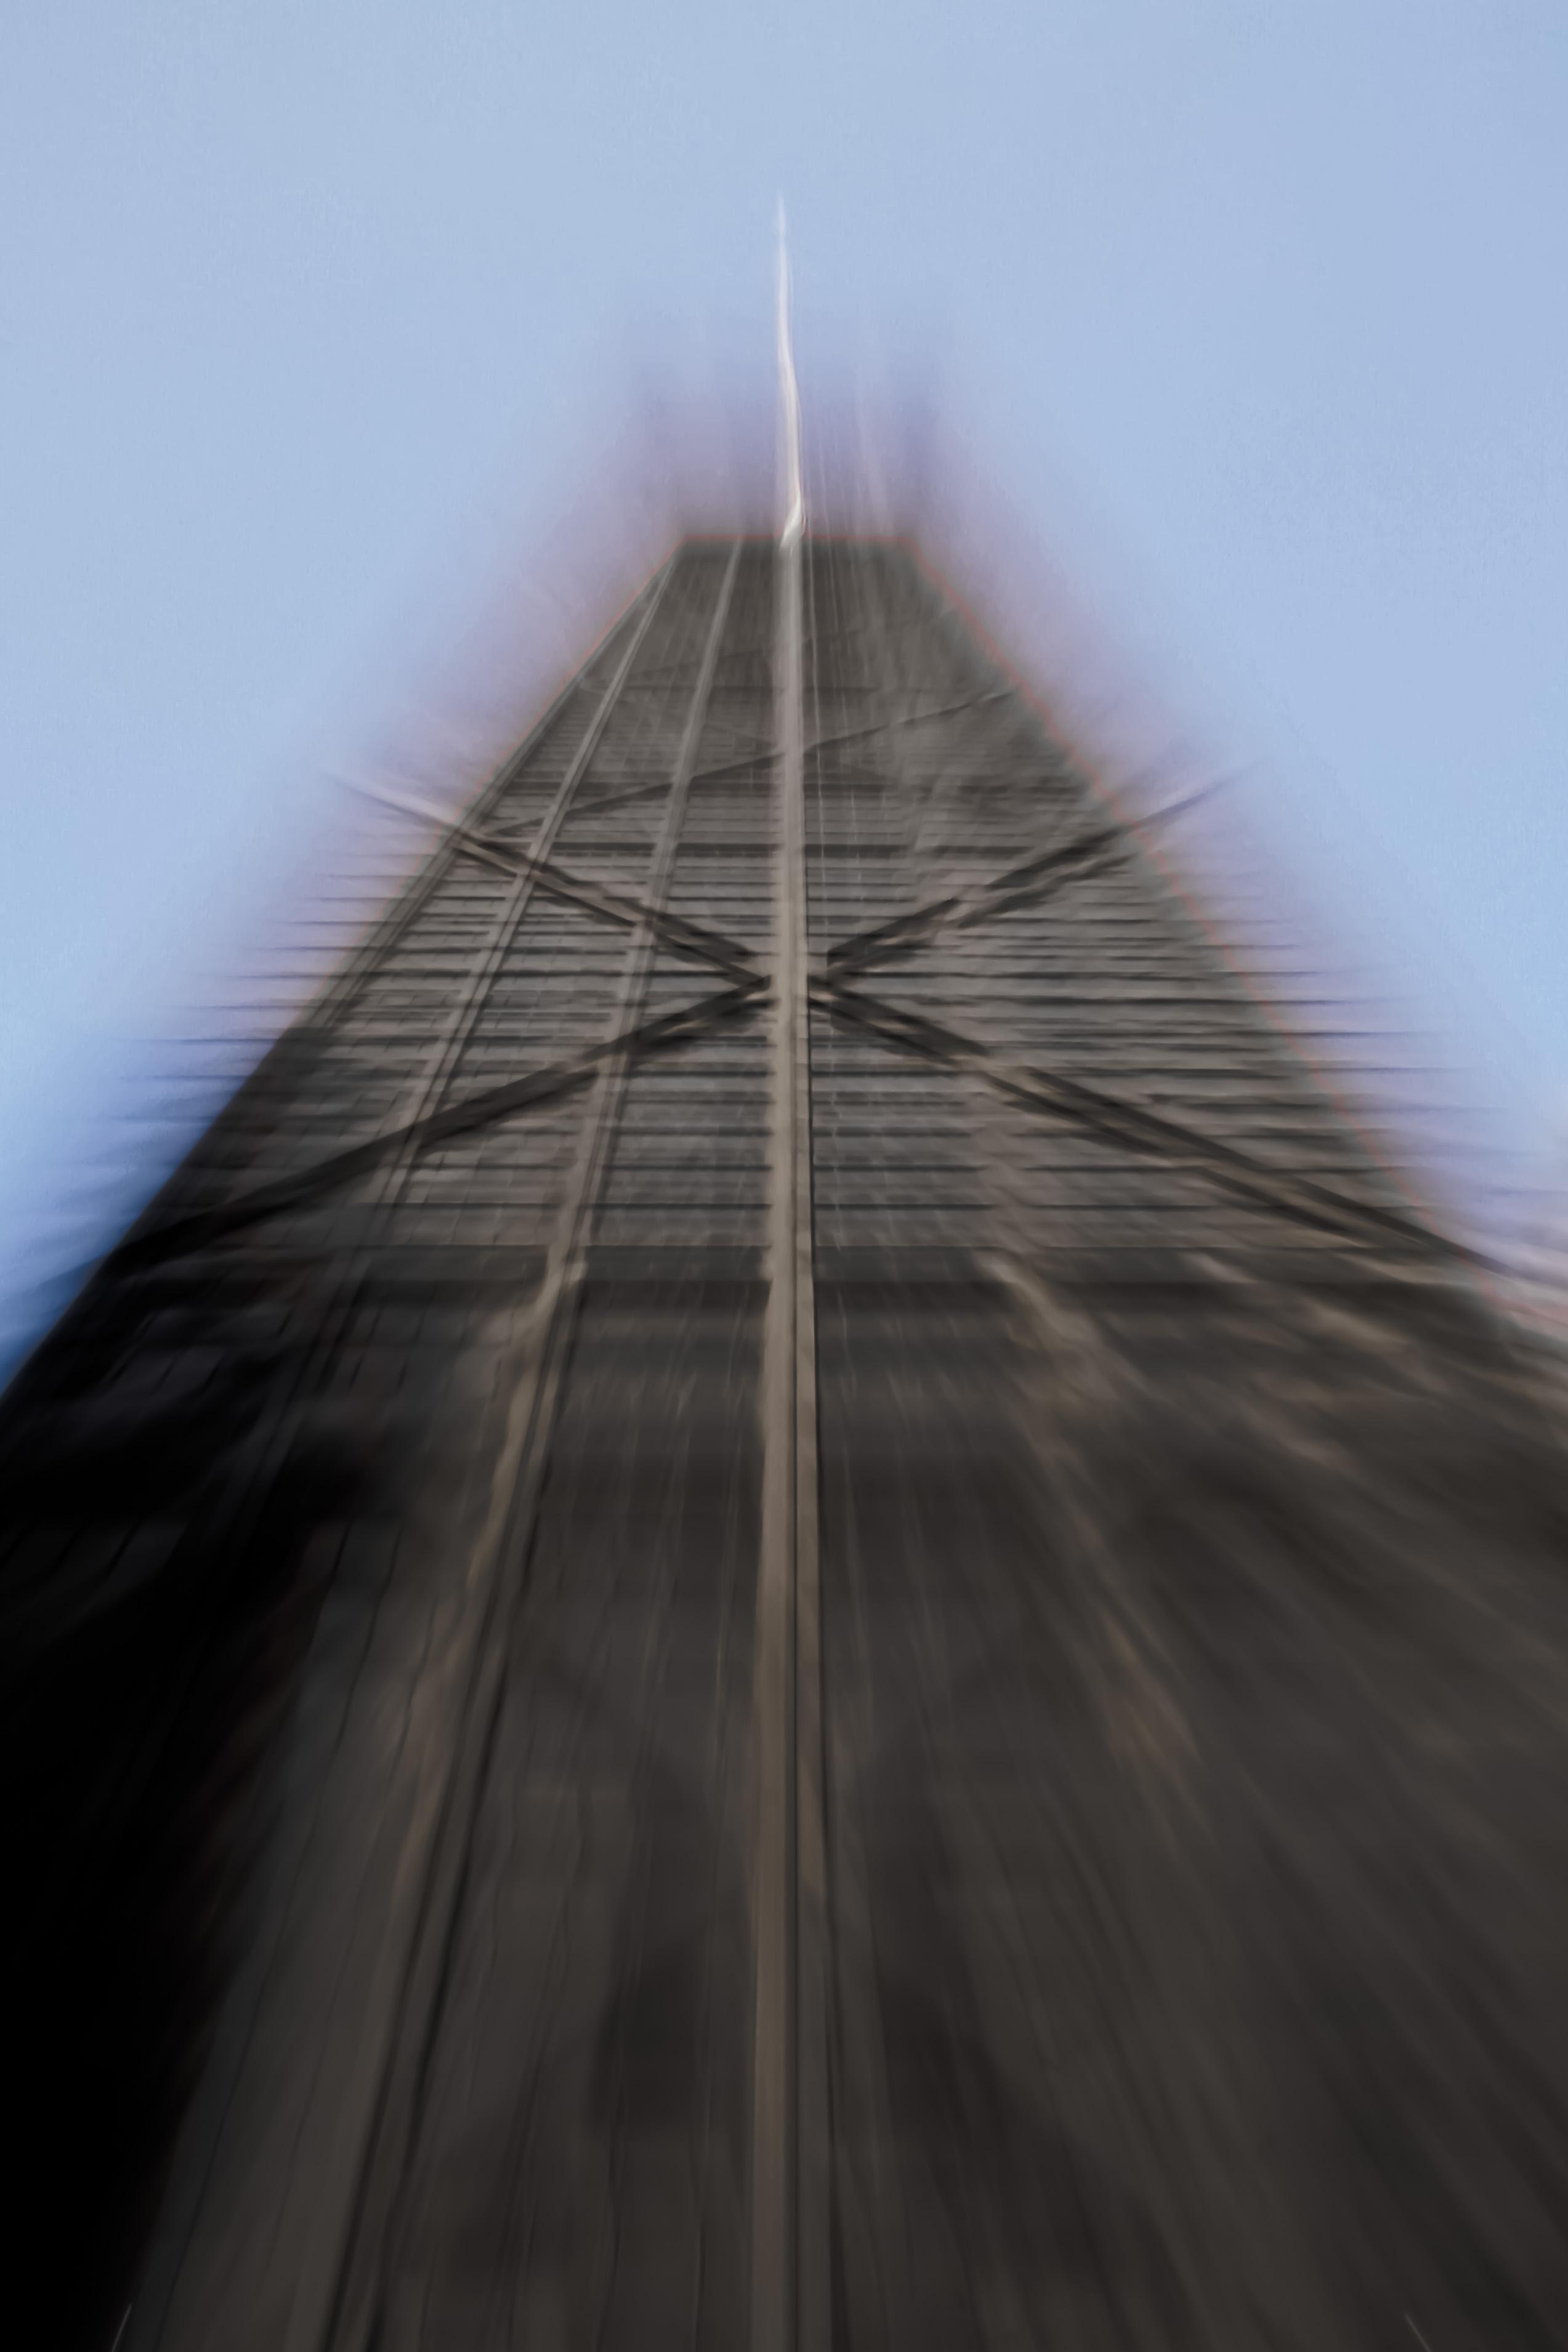 Magz_P-FAP_12_Towers-_28_4000pixels